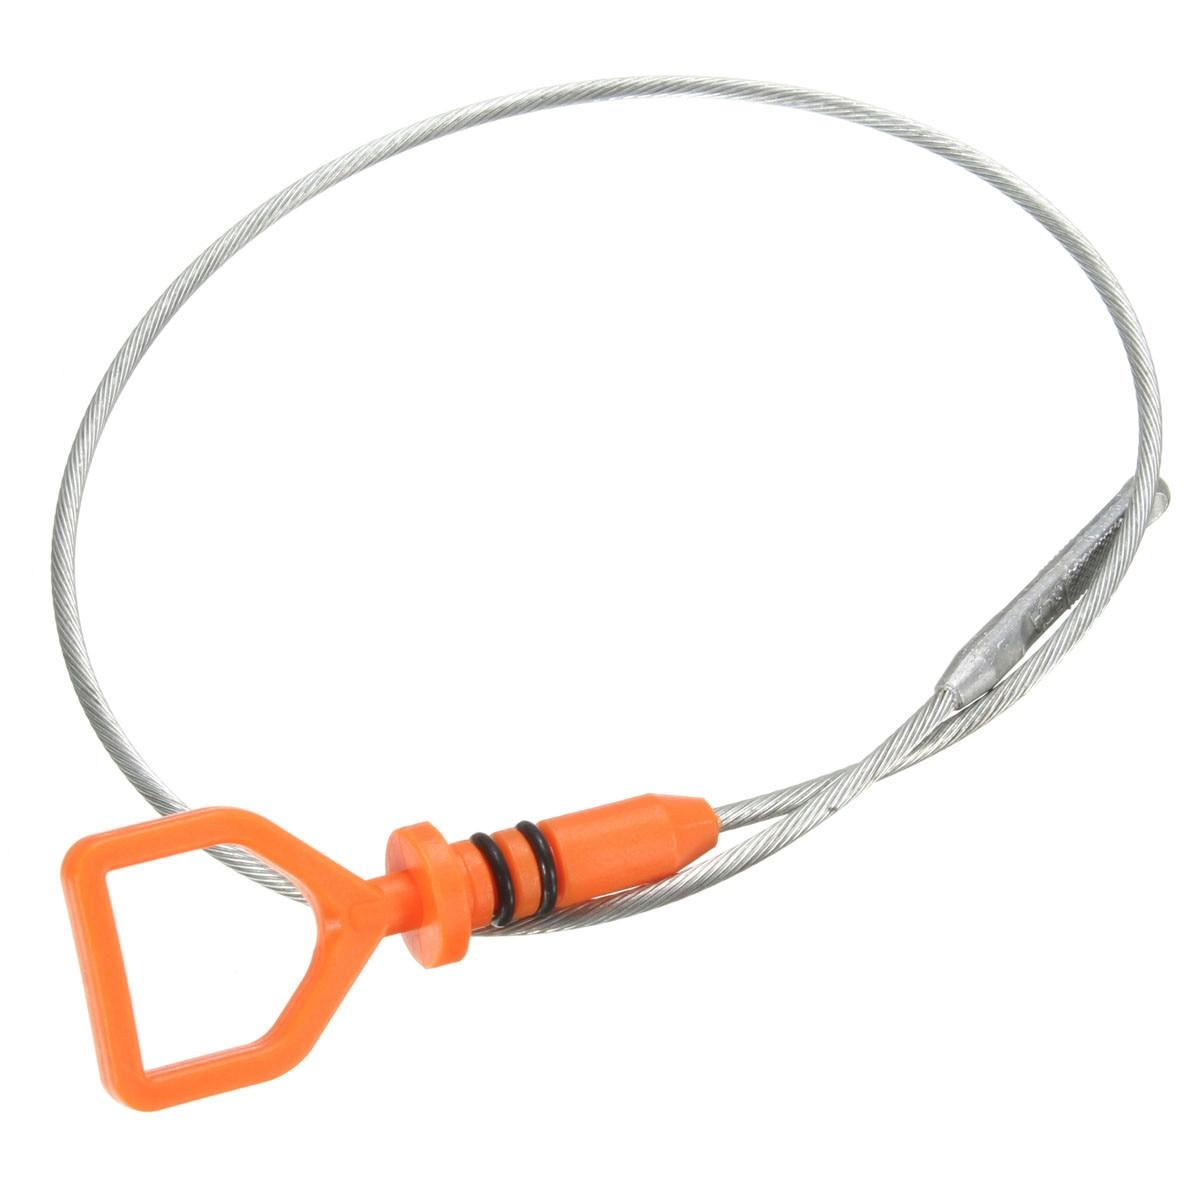 d16y8 wiring harness diagram allen bradley 4 pin connector honda wire tuck eg civic bay elsavadorla